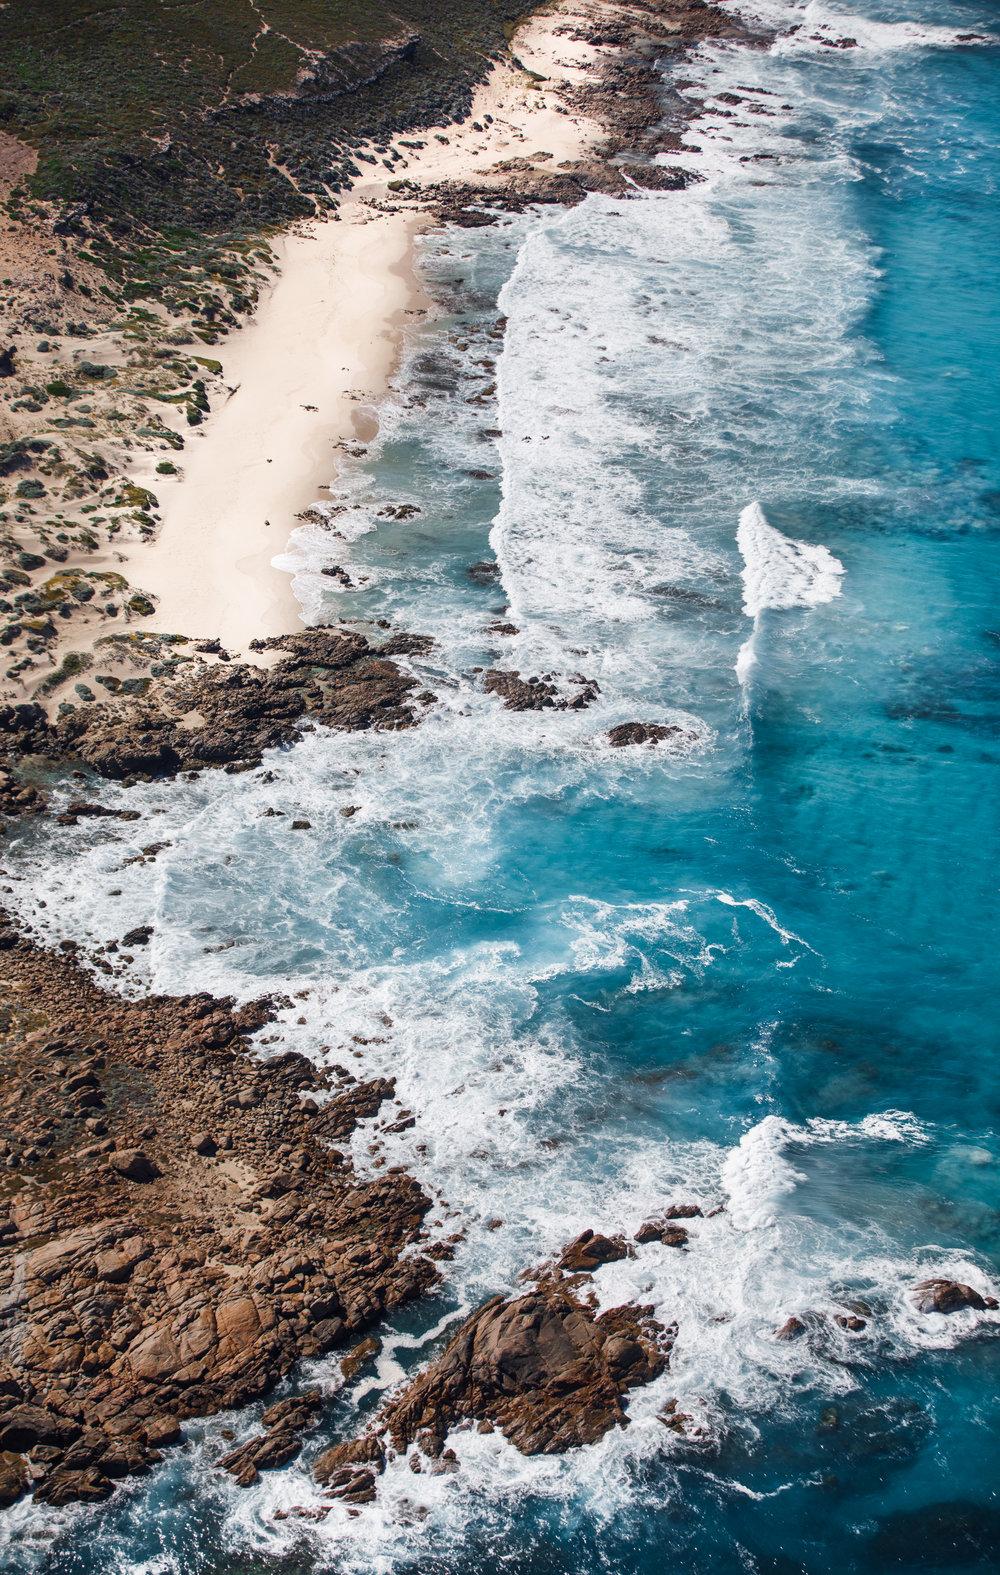 Samuel_Hesketh_Photography_Western_Australia-18.jpg